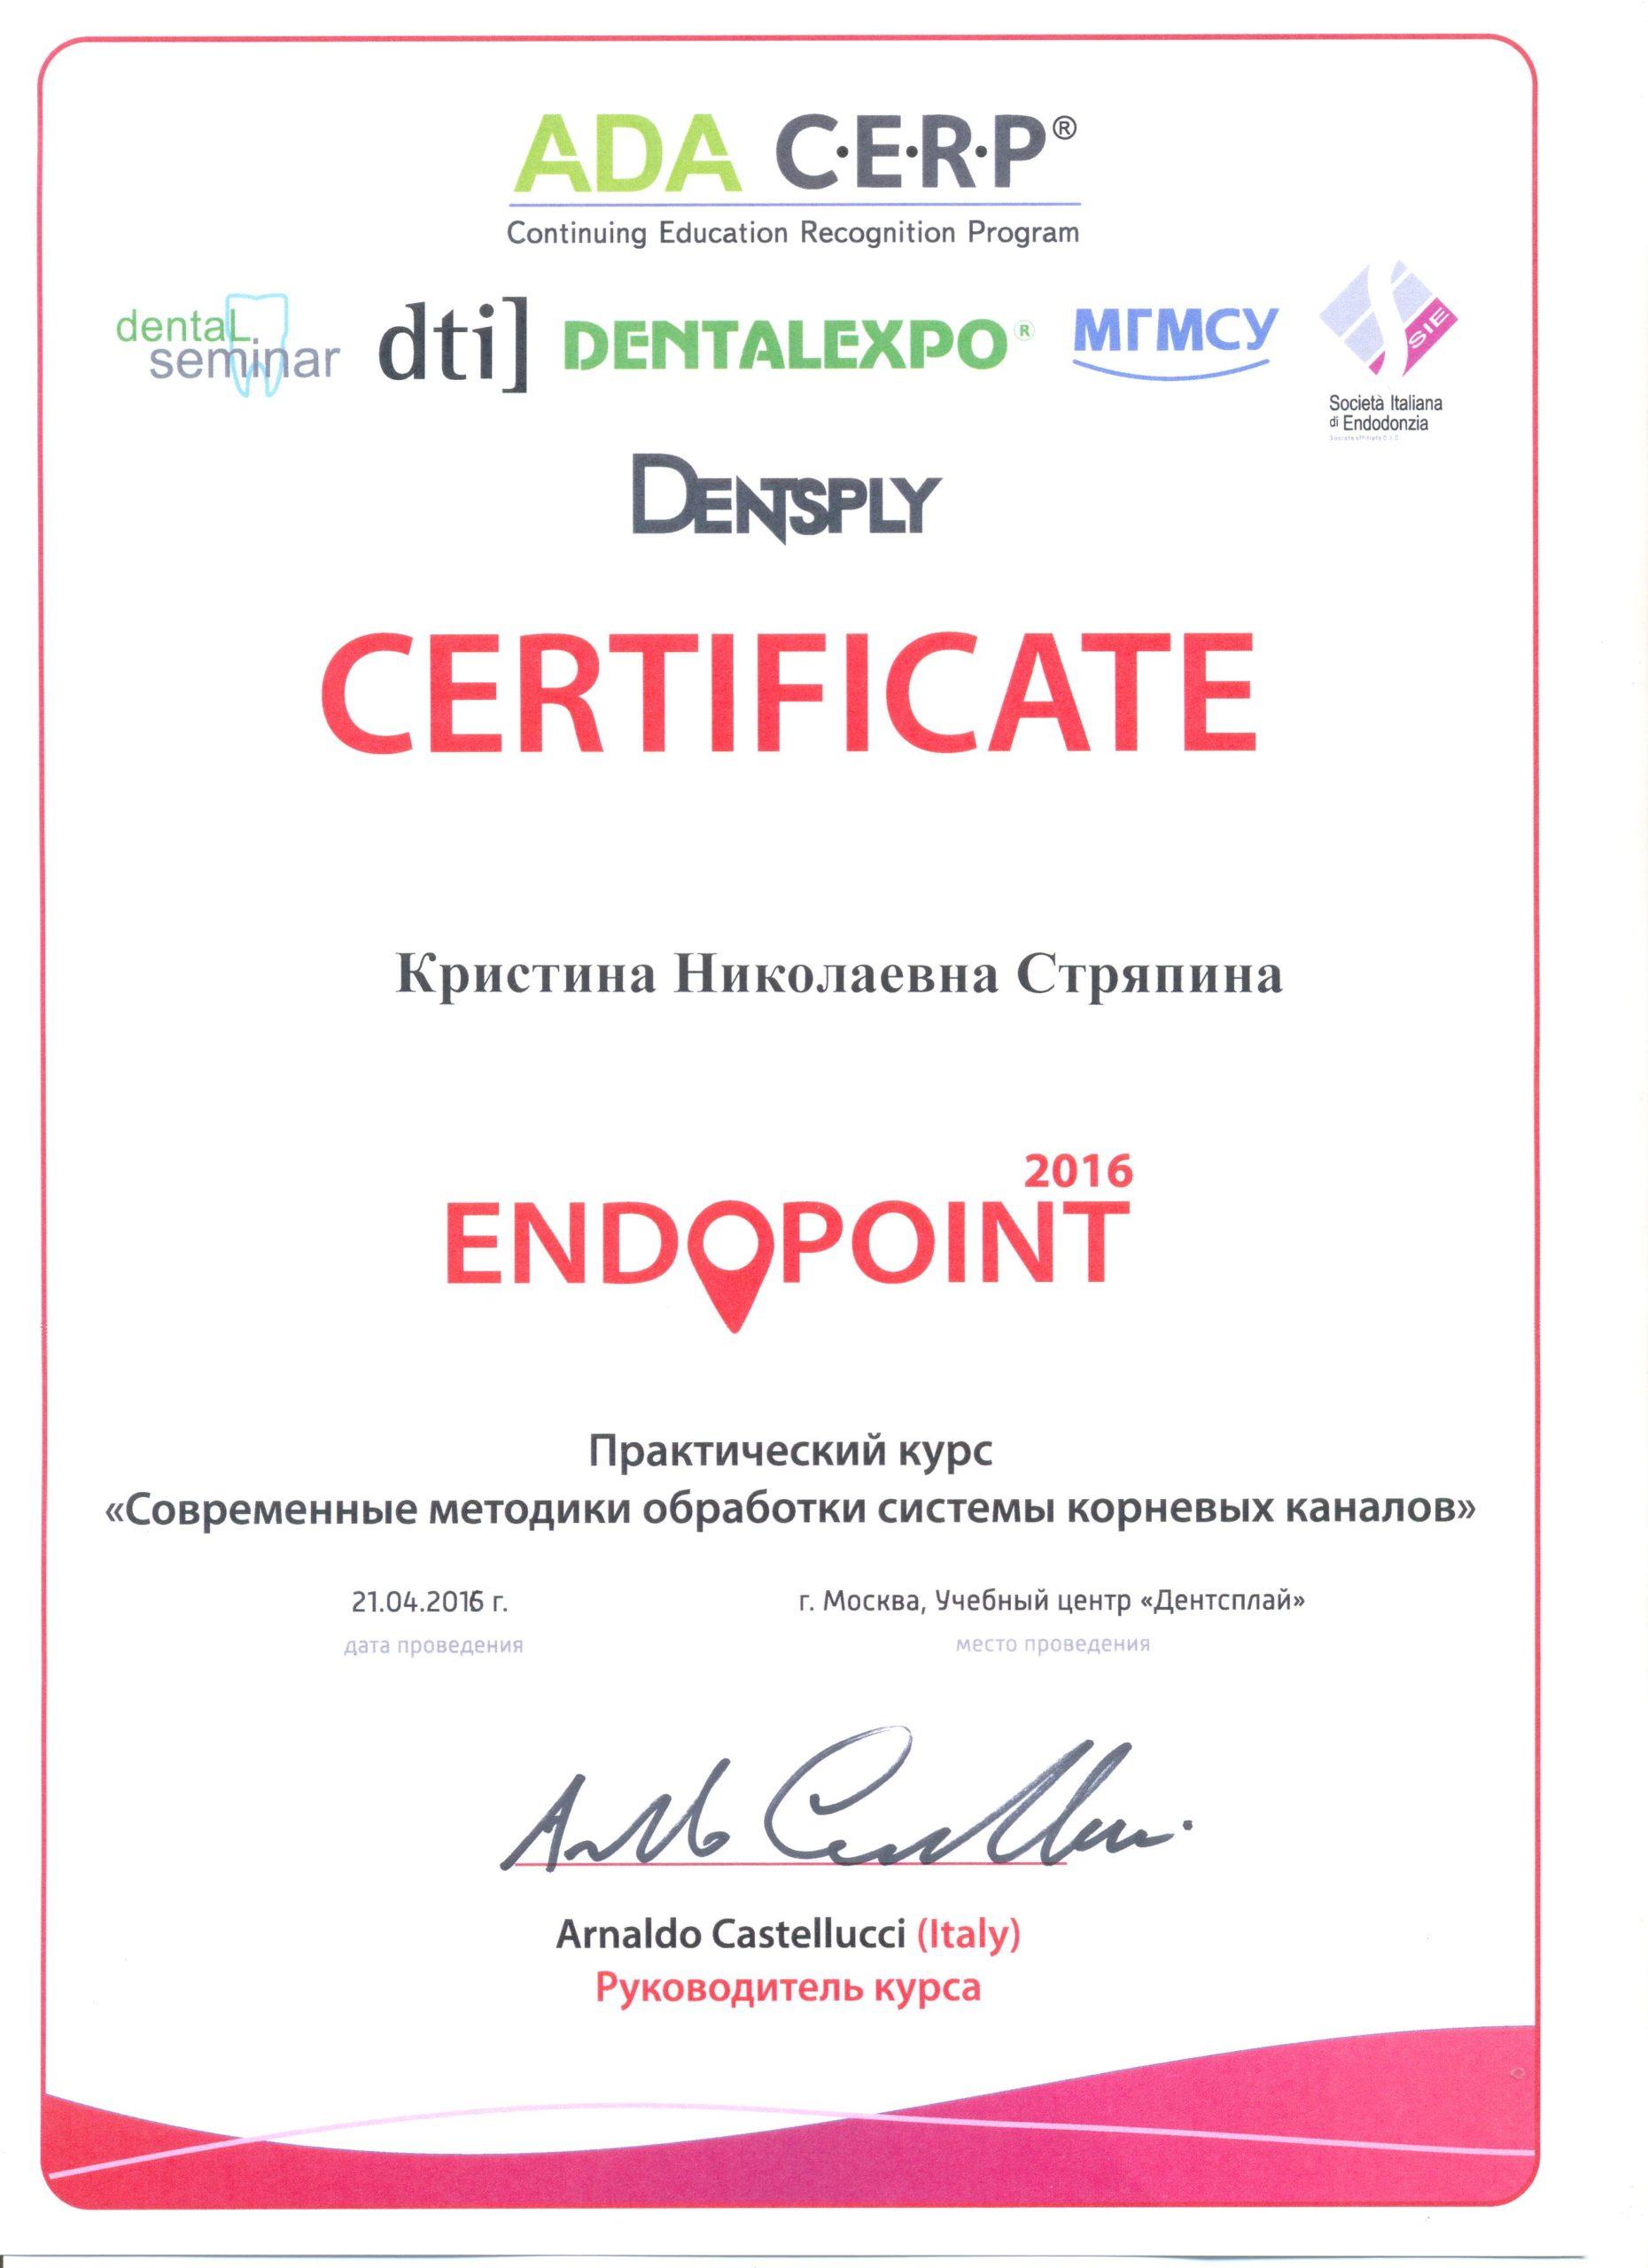 Сертификат Стряпиной Кристины (2016)